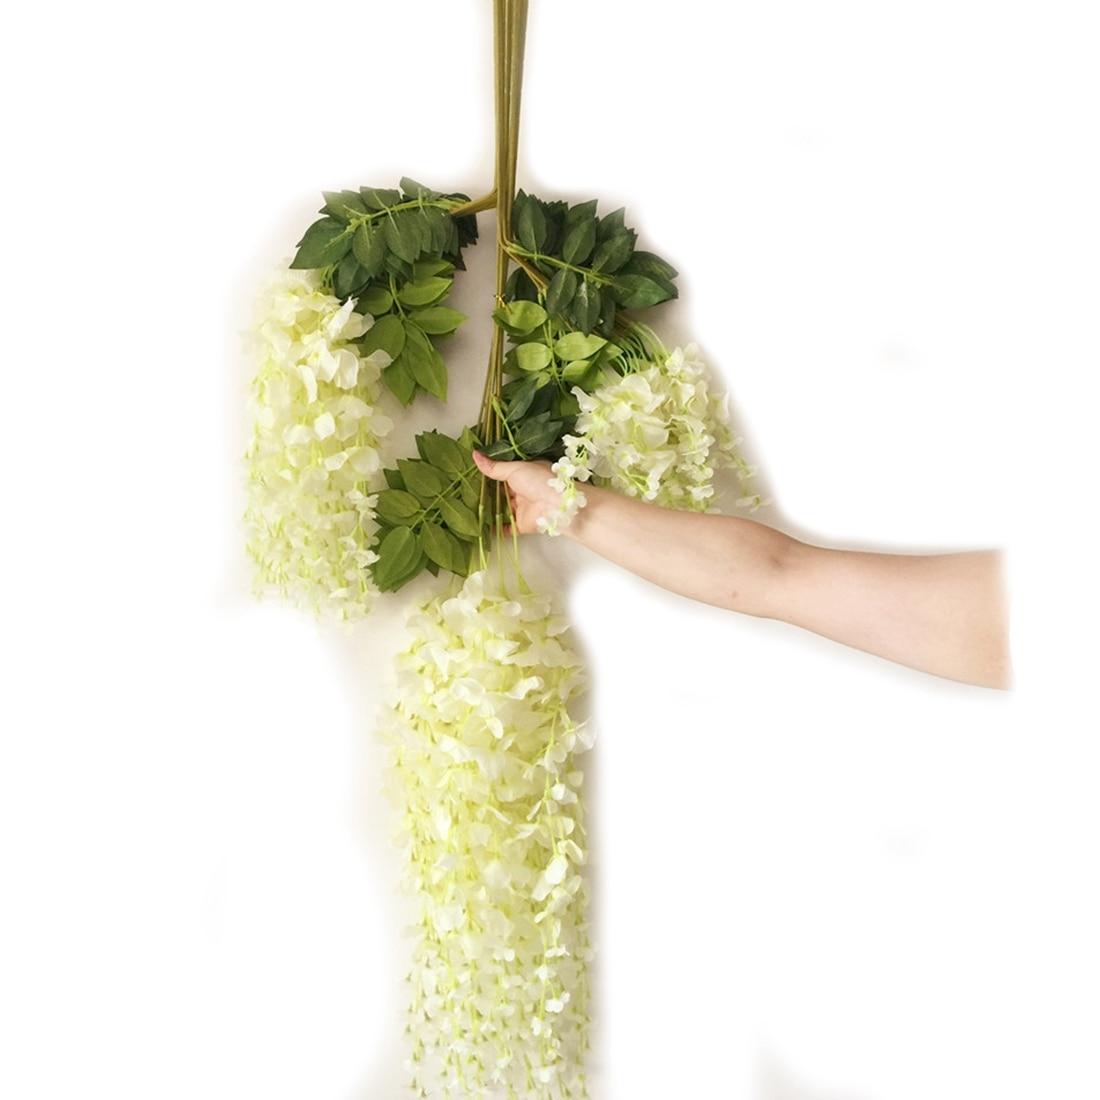 Silk Wisteria Vines 12 stks 105 cm Kunstmatige Wisteria Bloem - Feestversiering en feestartikelen